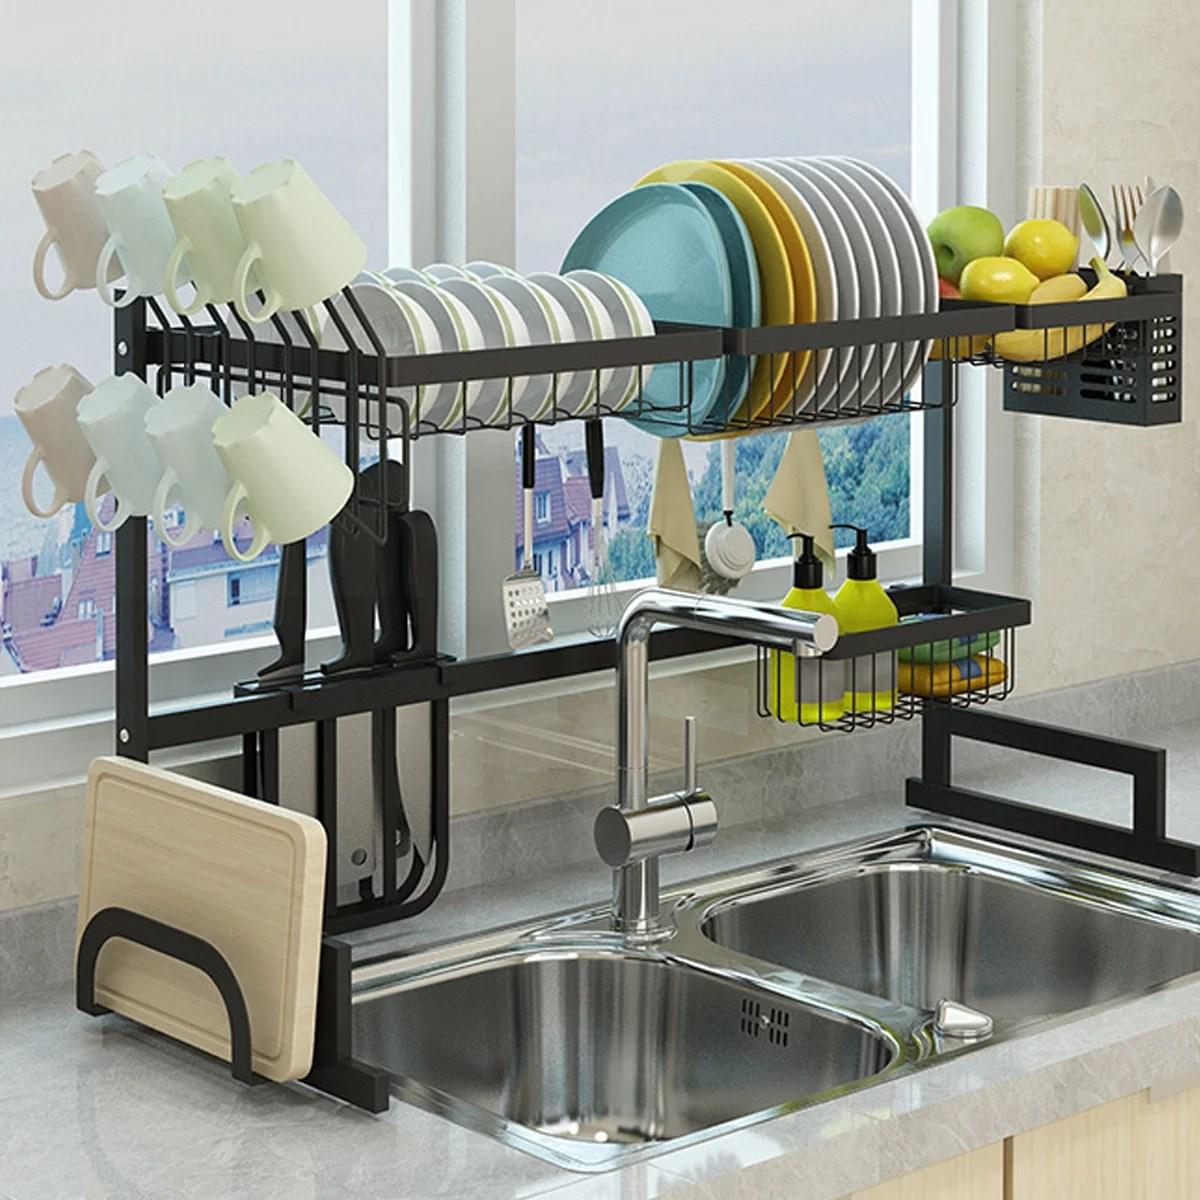 sink rack dish drainer for kitchen sink racks stainless steel over the sink shelf storage rack sink size 32 5inch black 33 5x12 5x20 5inch